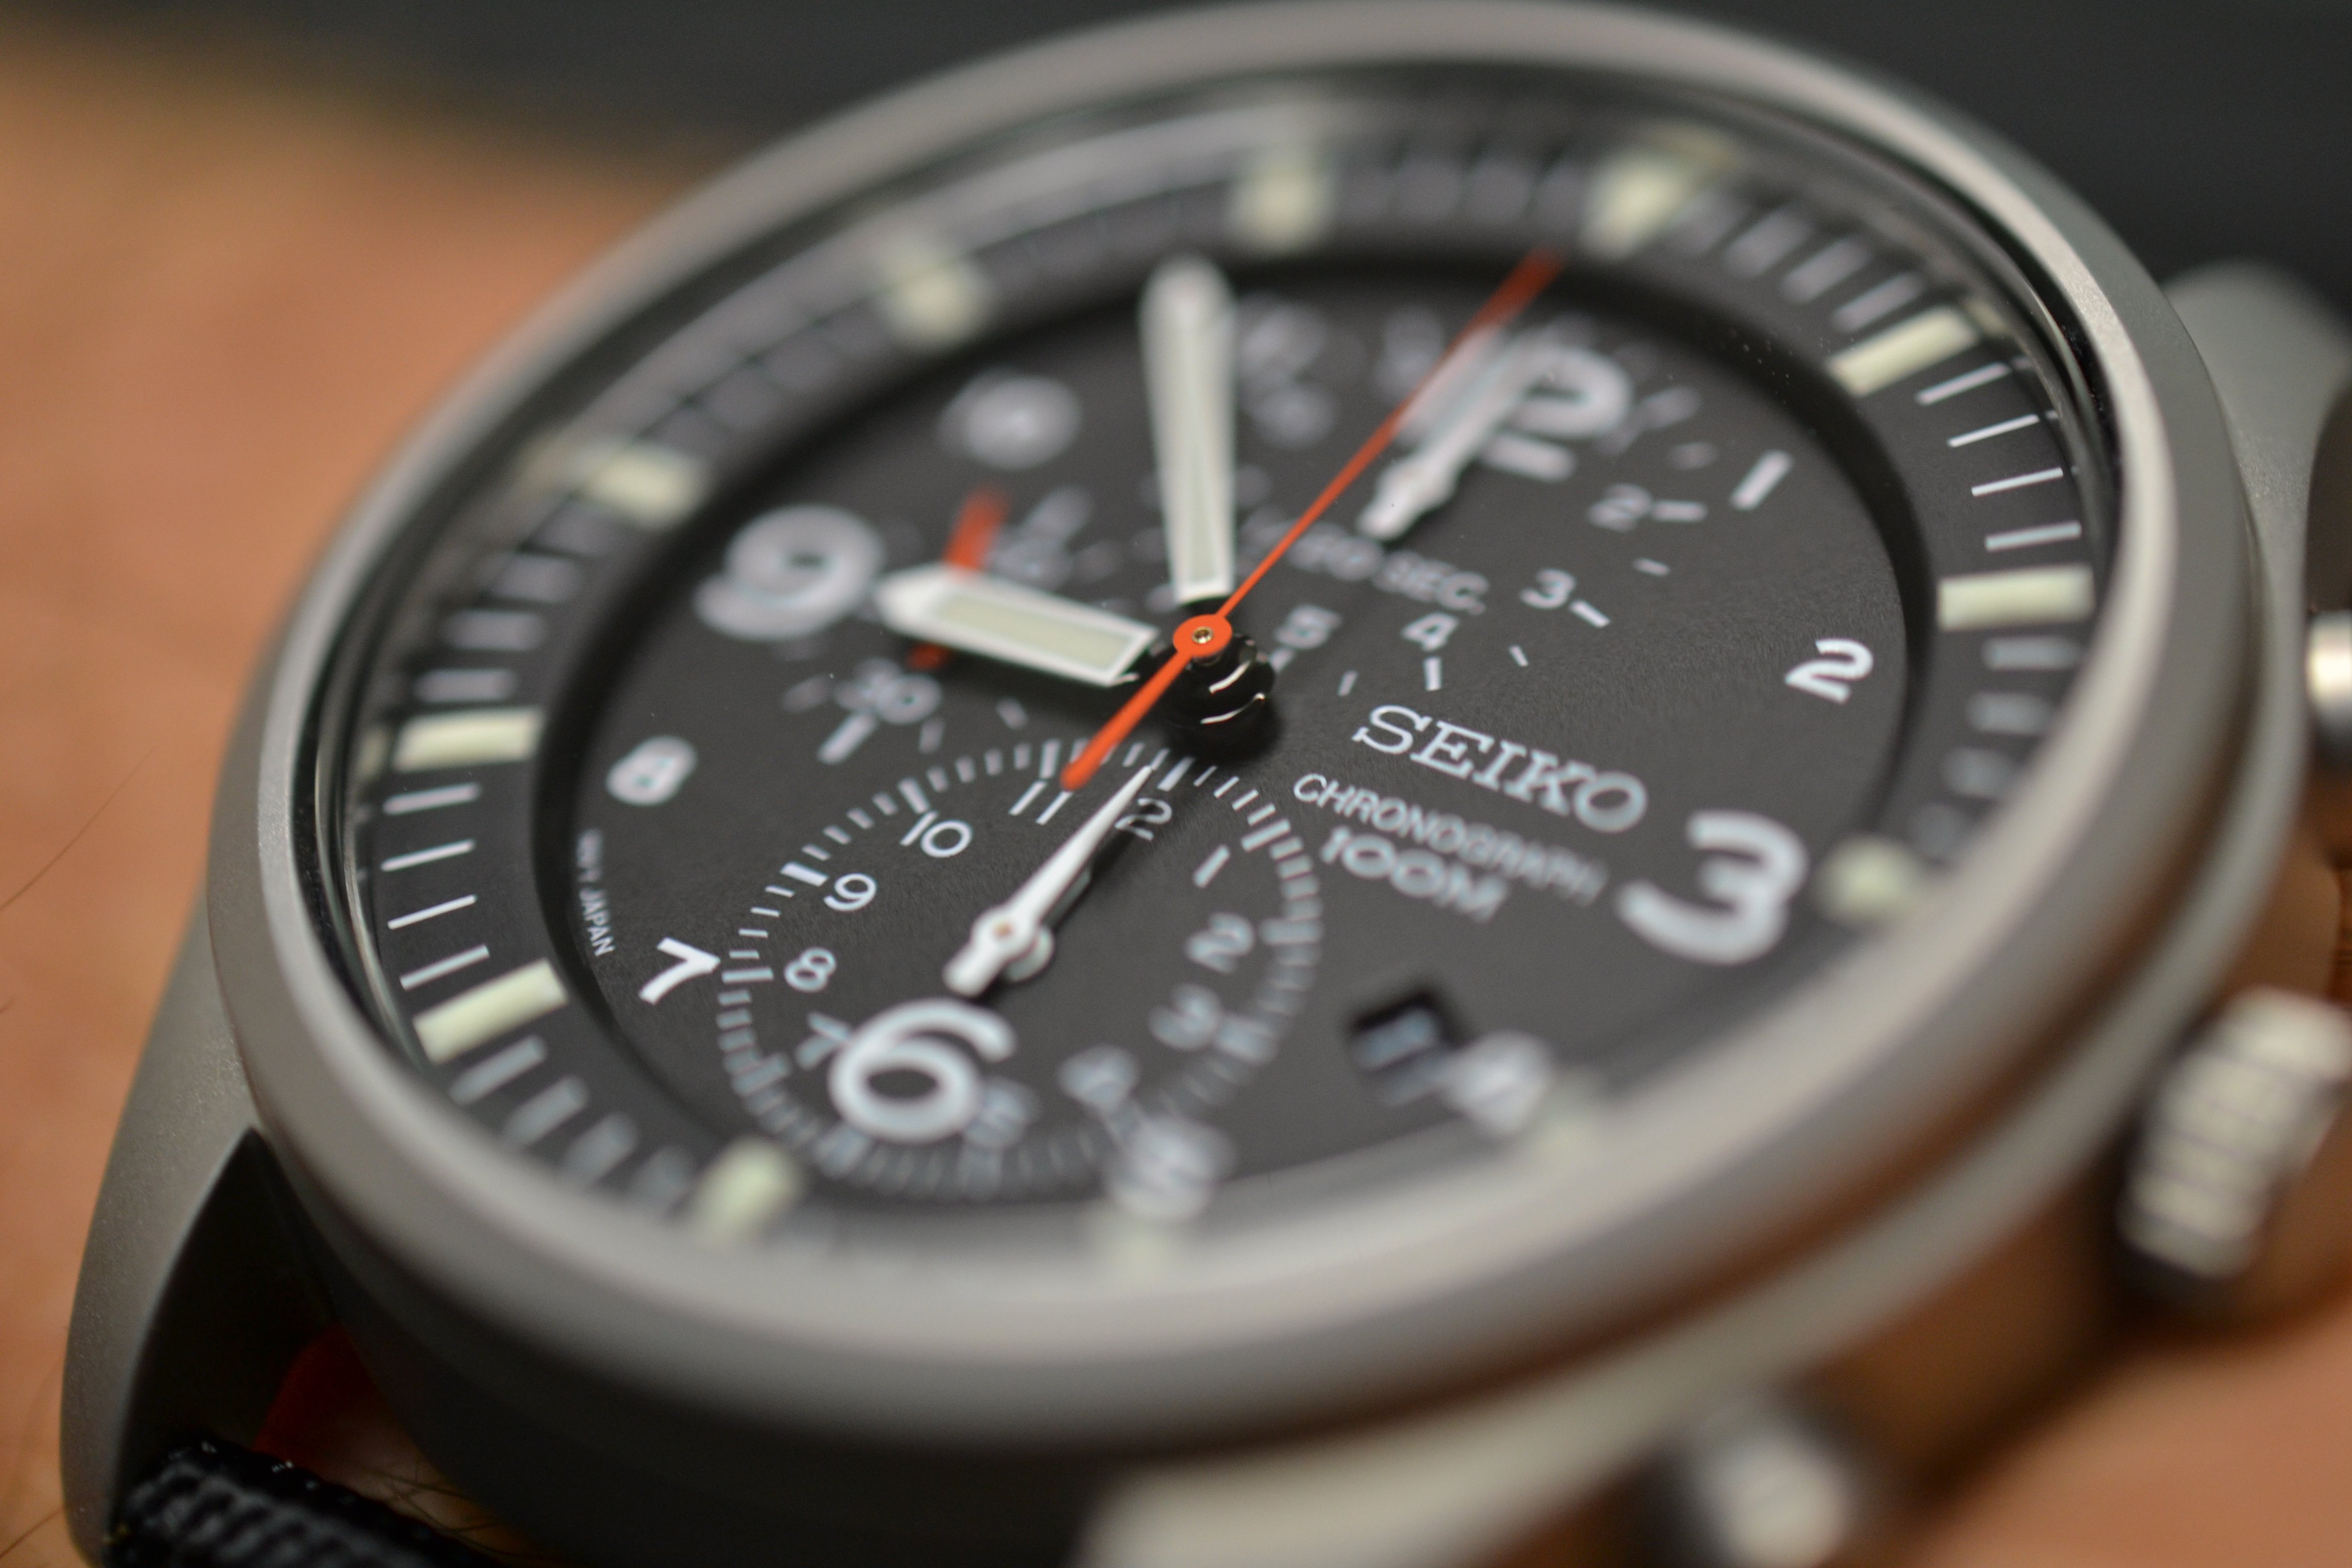 Seiko SNDA57 Black Dial Analog Watch Review